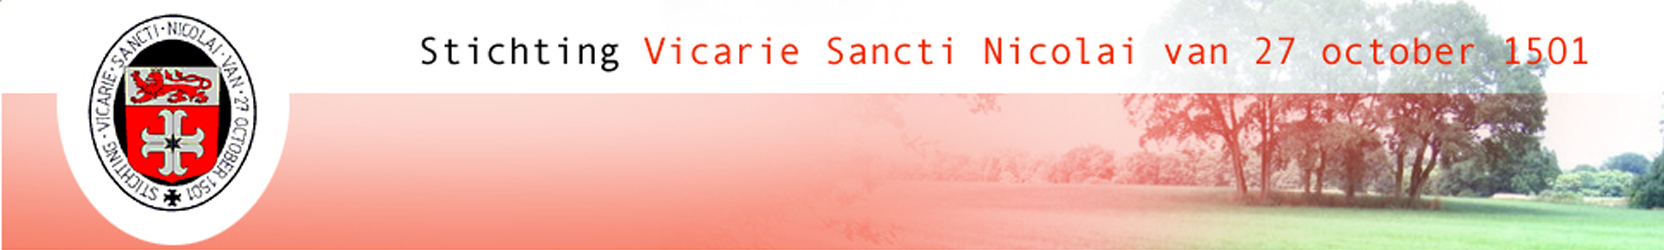 Foundation Vicarie Sancti Nicolai